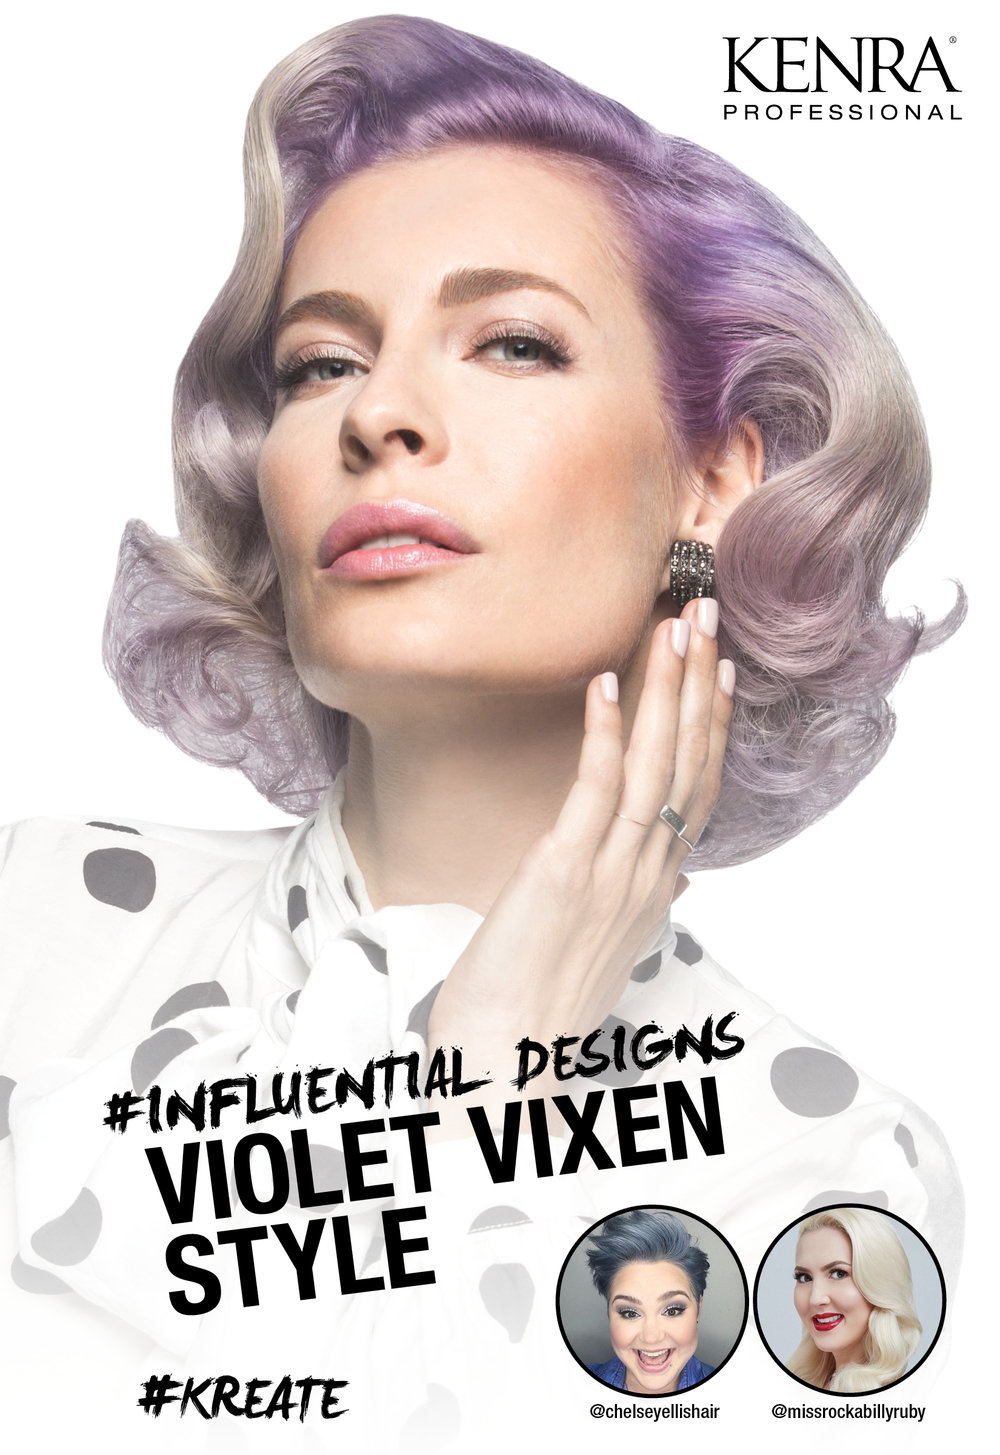 00000_VioletVixen_Style.jpg